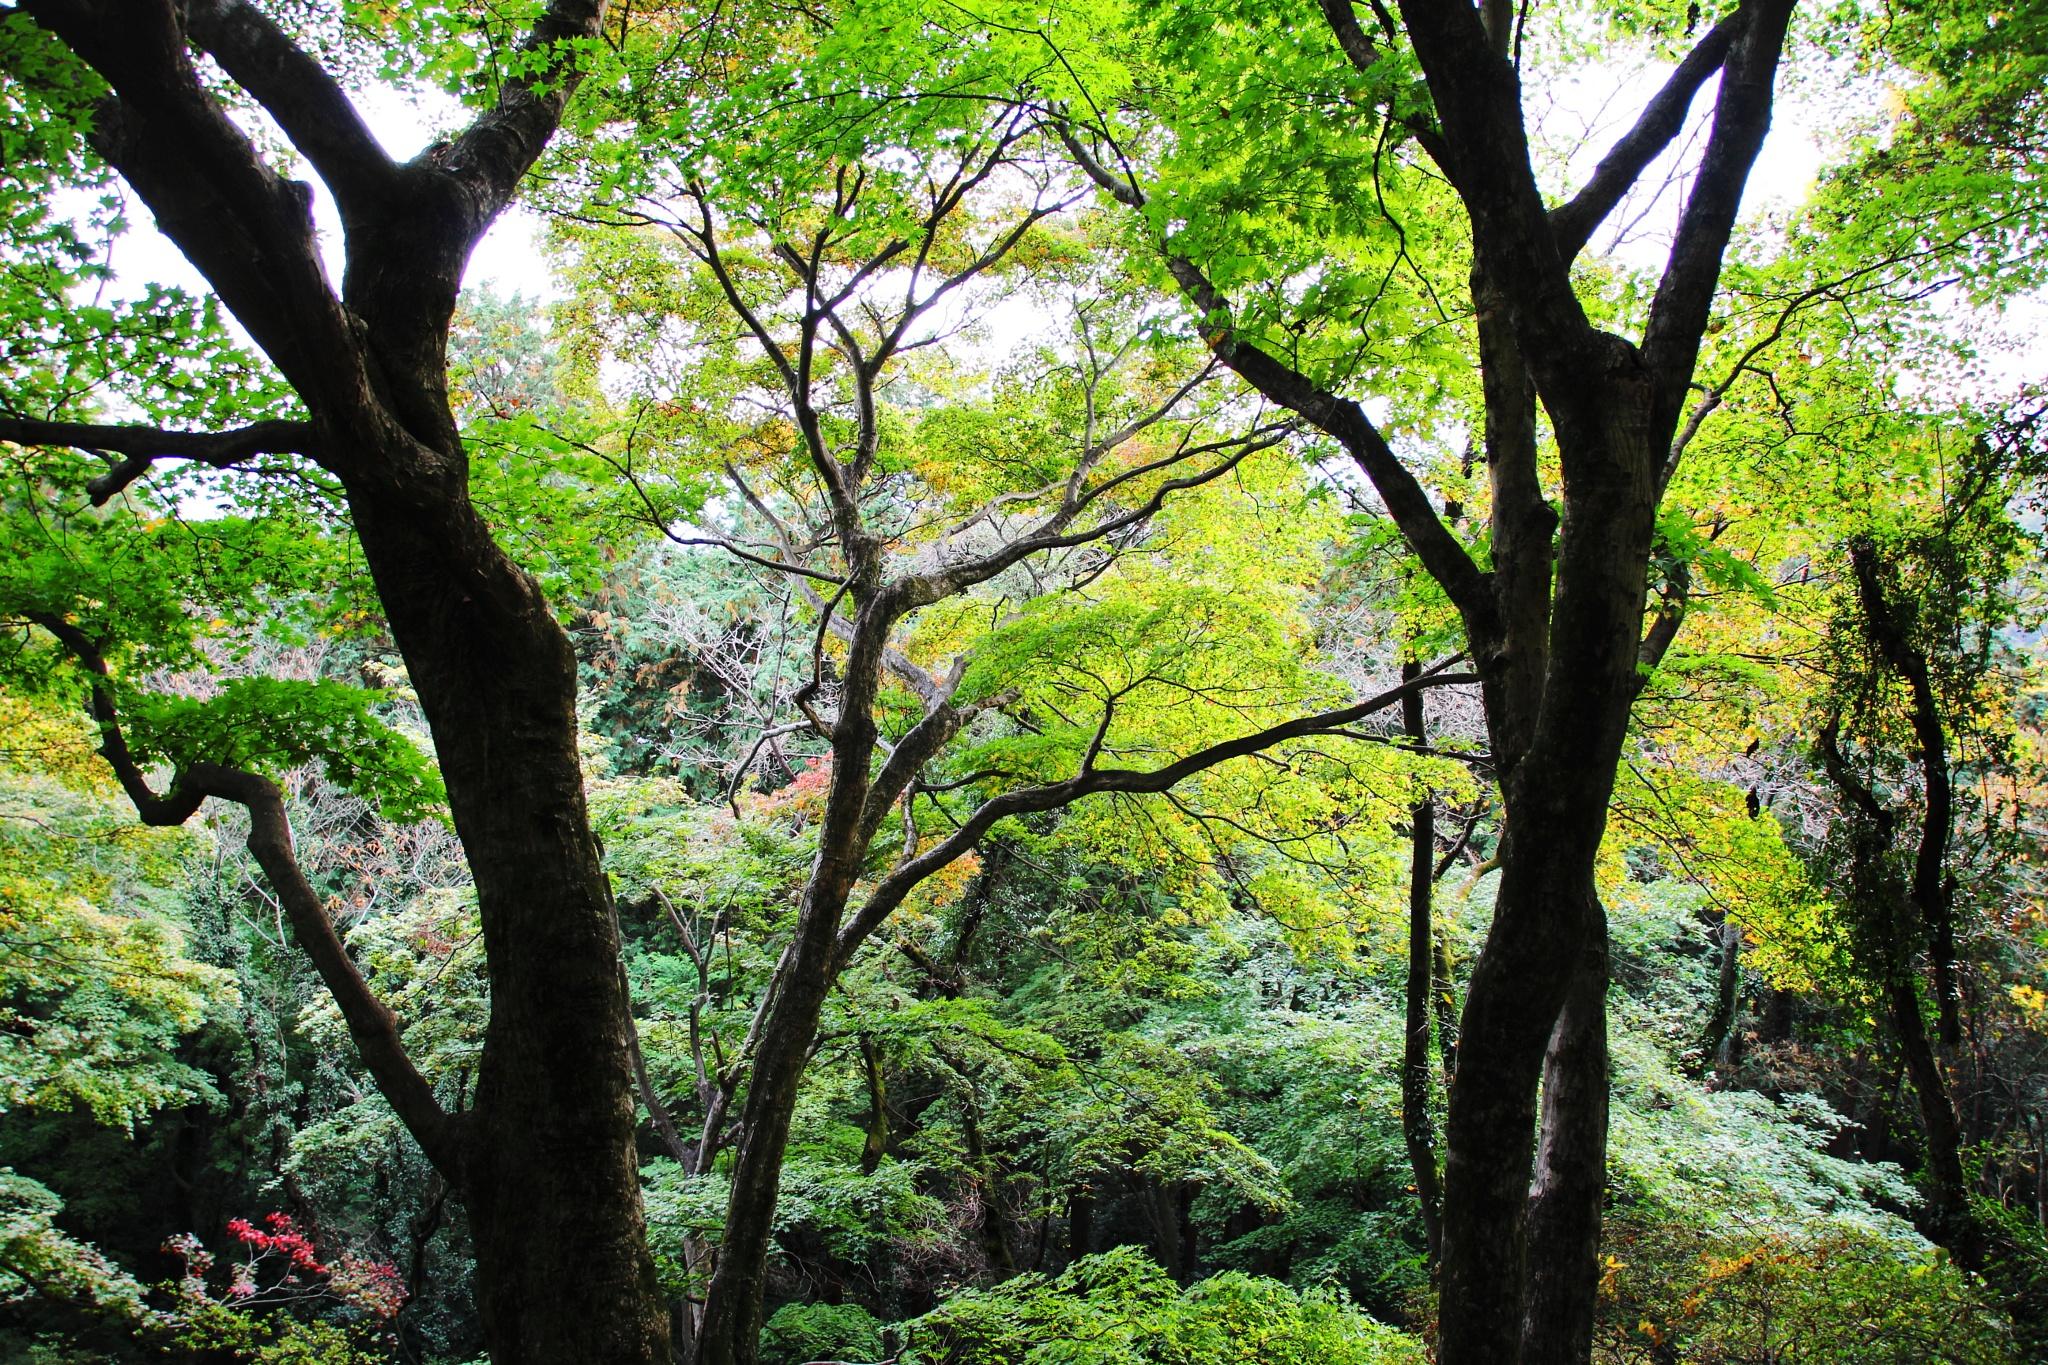 Forest in autumn by shigeo yukizawa